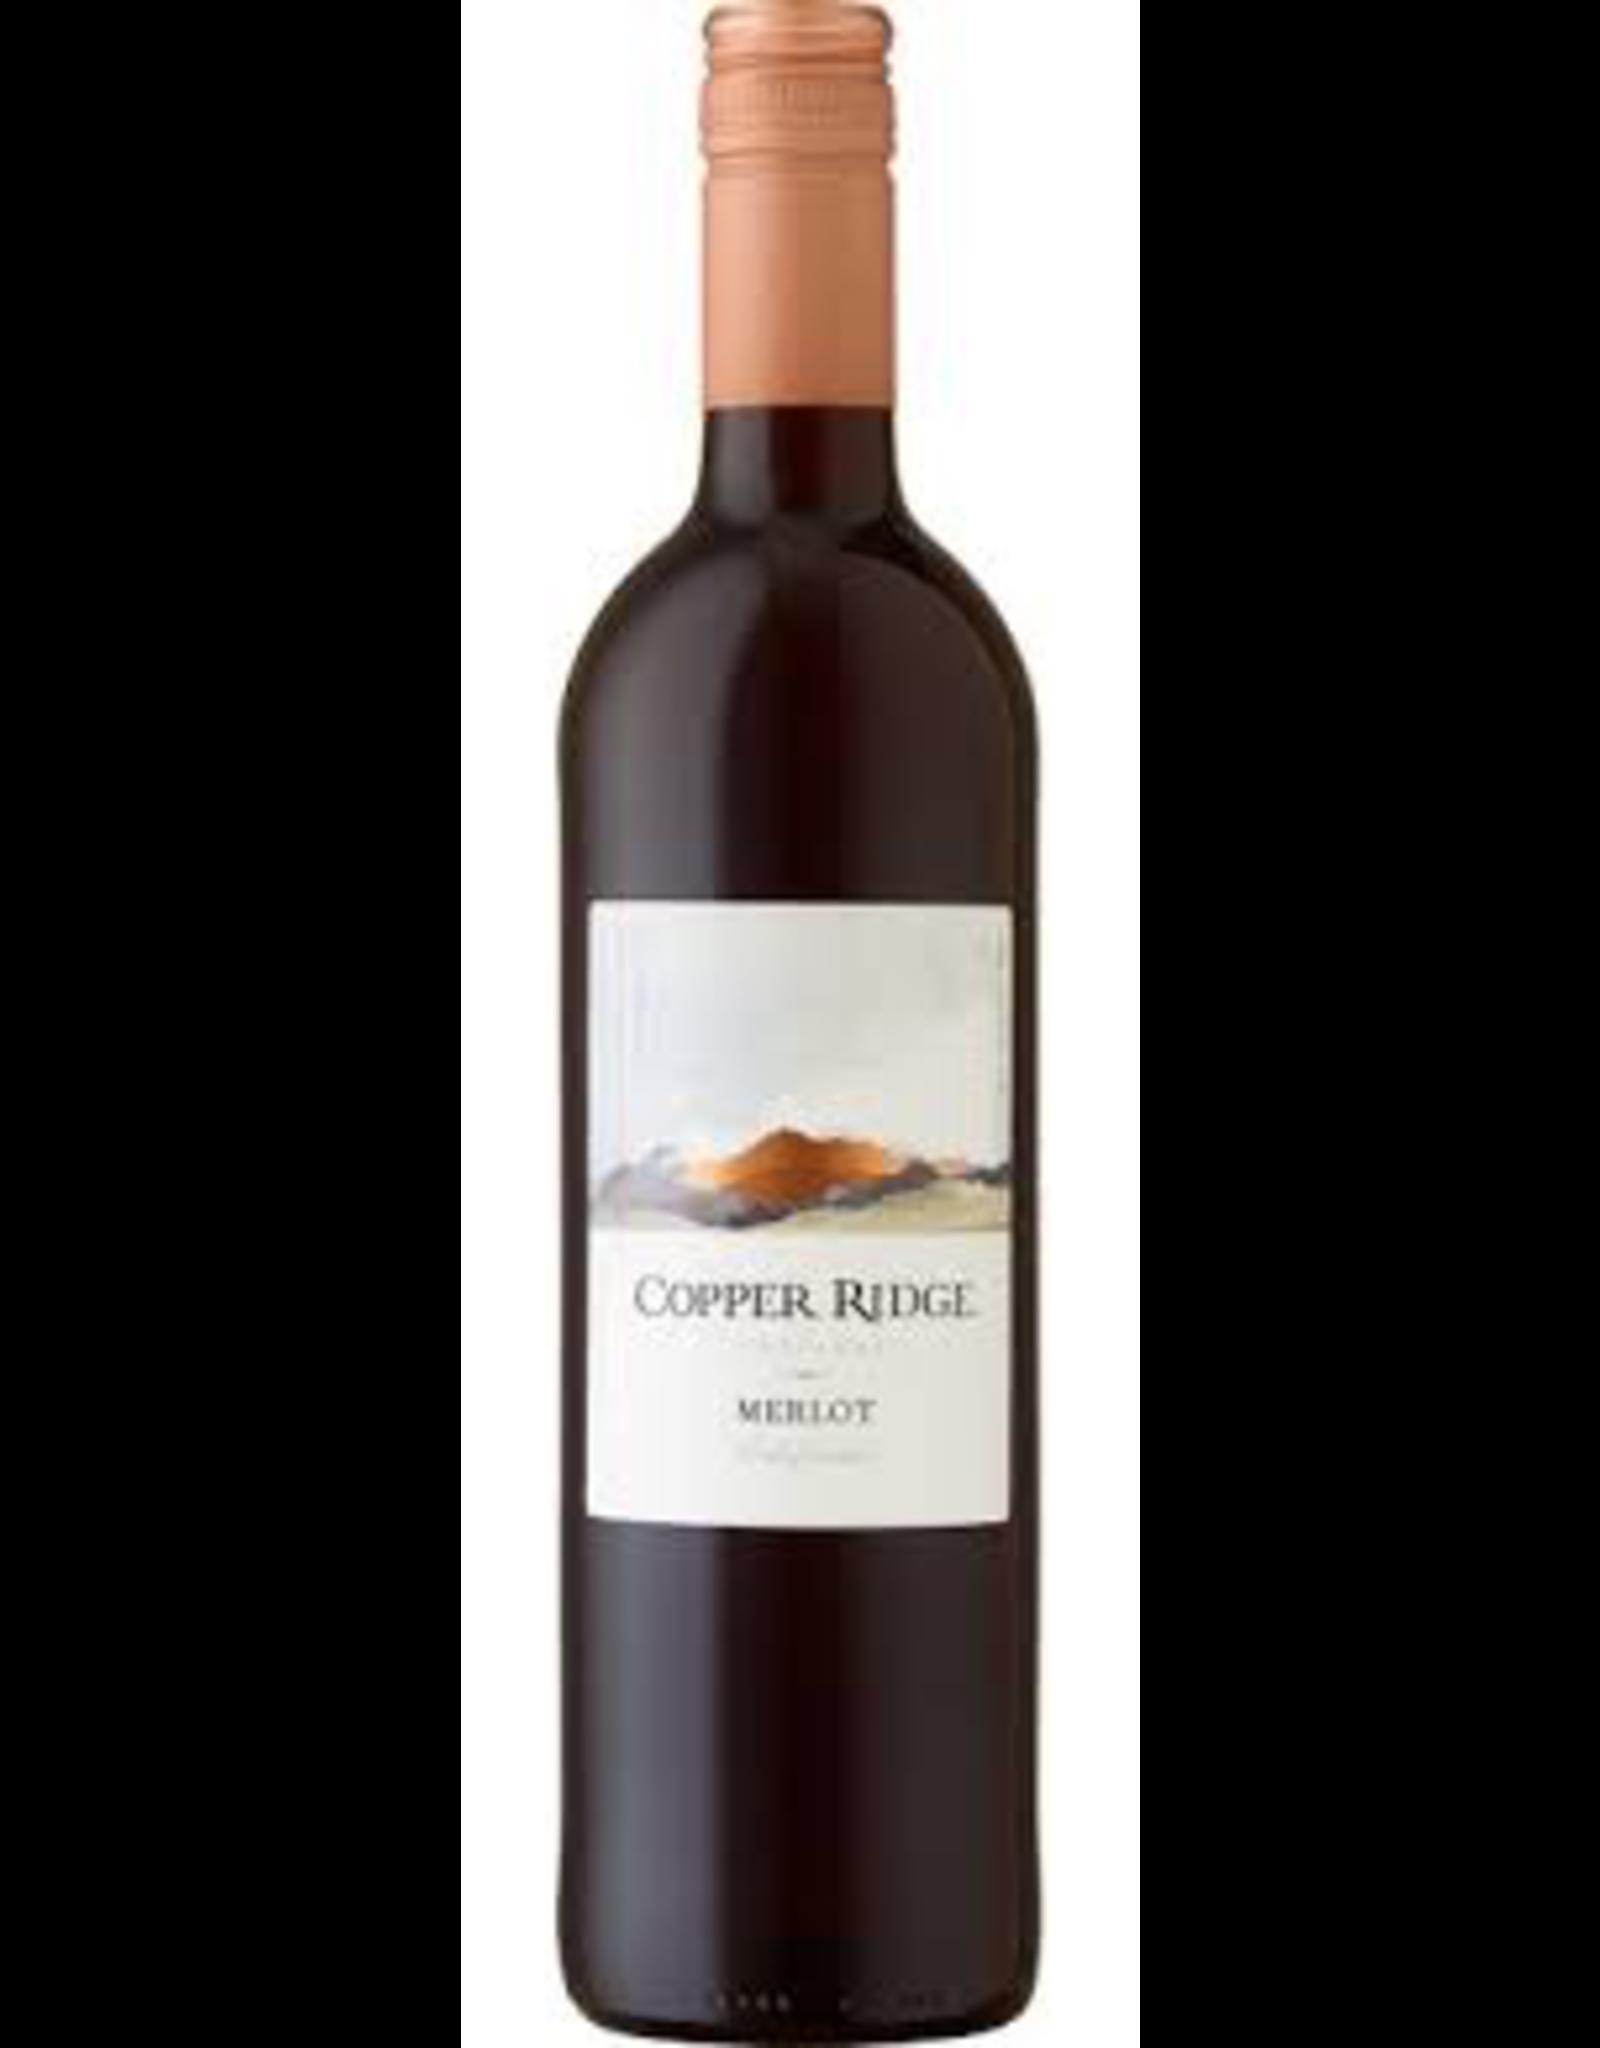 Red Wine NV, Copper Ridge Vineyards, Merlot, Multi-AVA, Napa, California, 12% Alc, CT